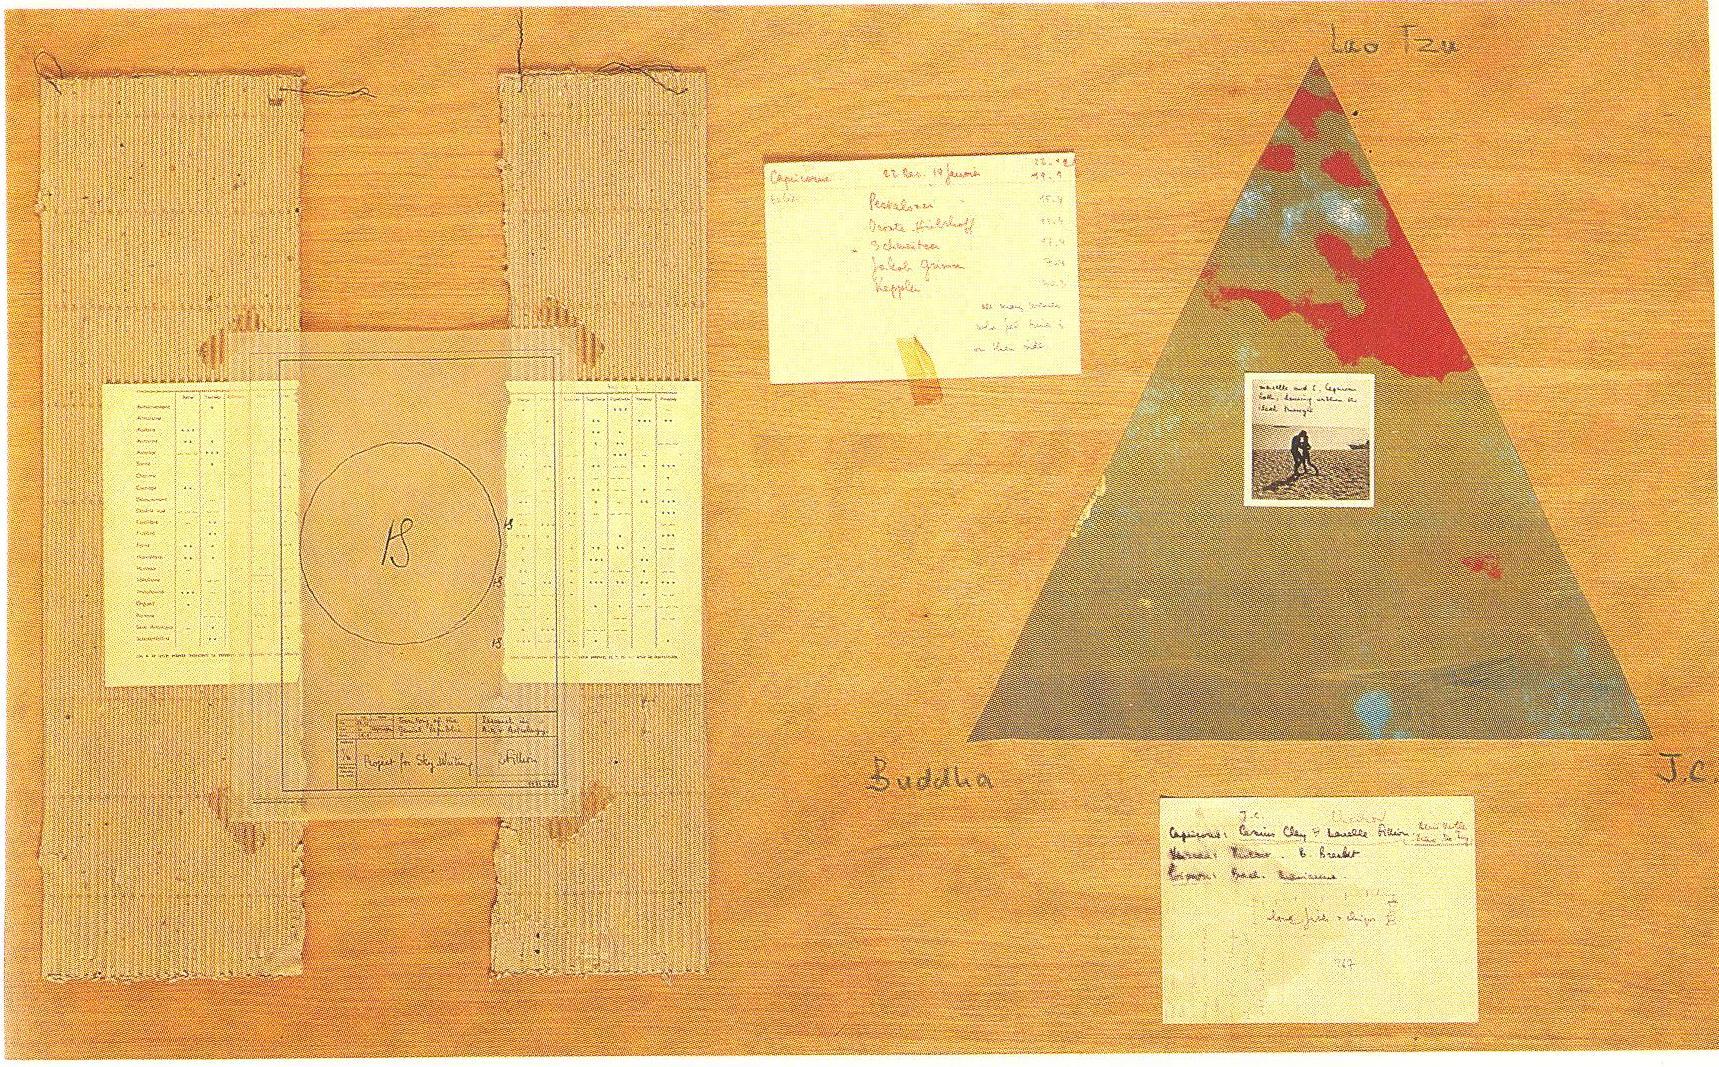 Robert Filliou, Research on Art and Astrology, 1969 (Steinbock 1)